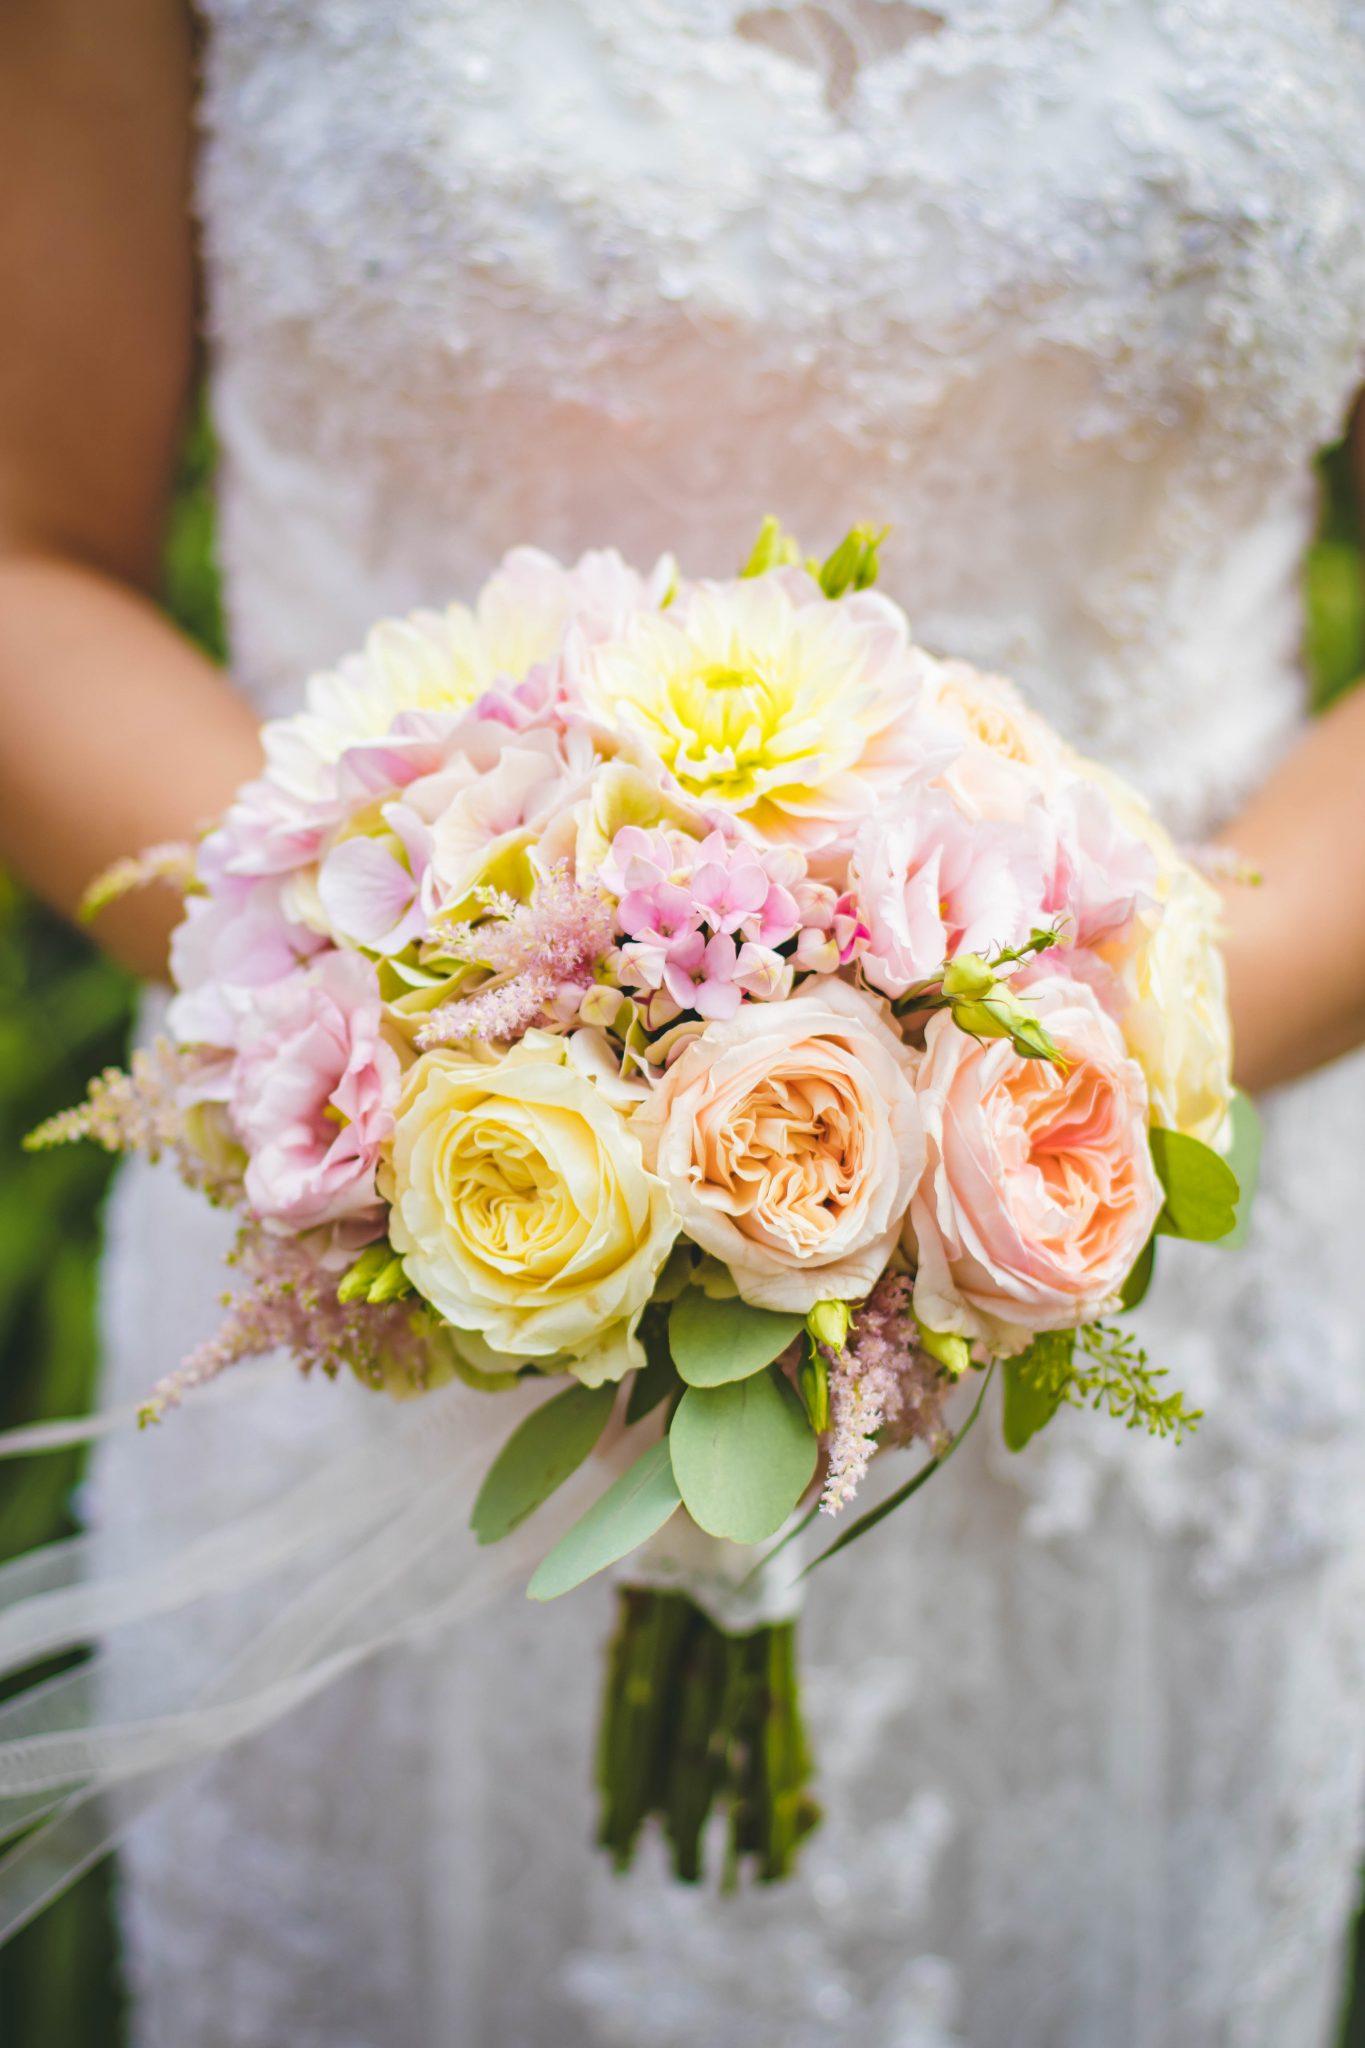 choose the perfect wedding vendor